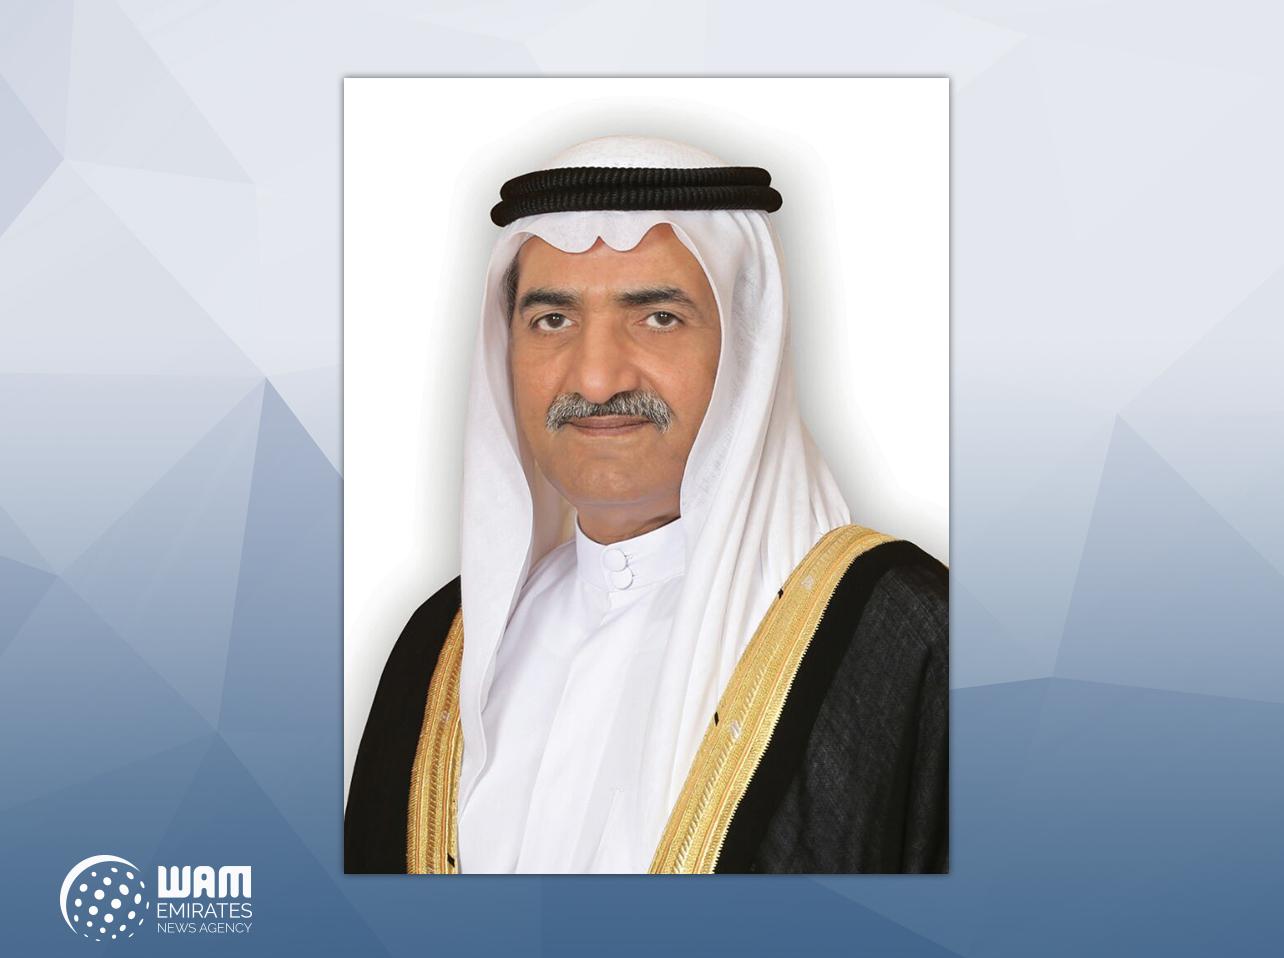 Emirates News Agency - Fujairah Ruler congratulates Bahrain King ...